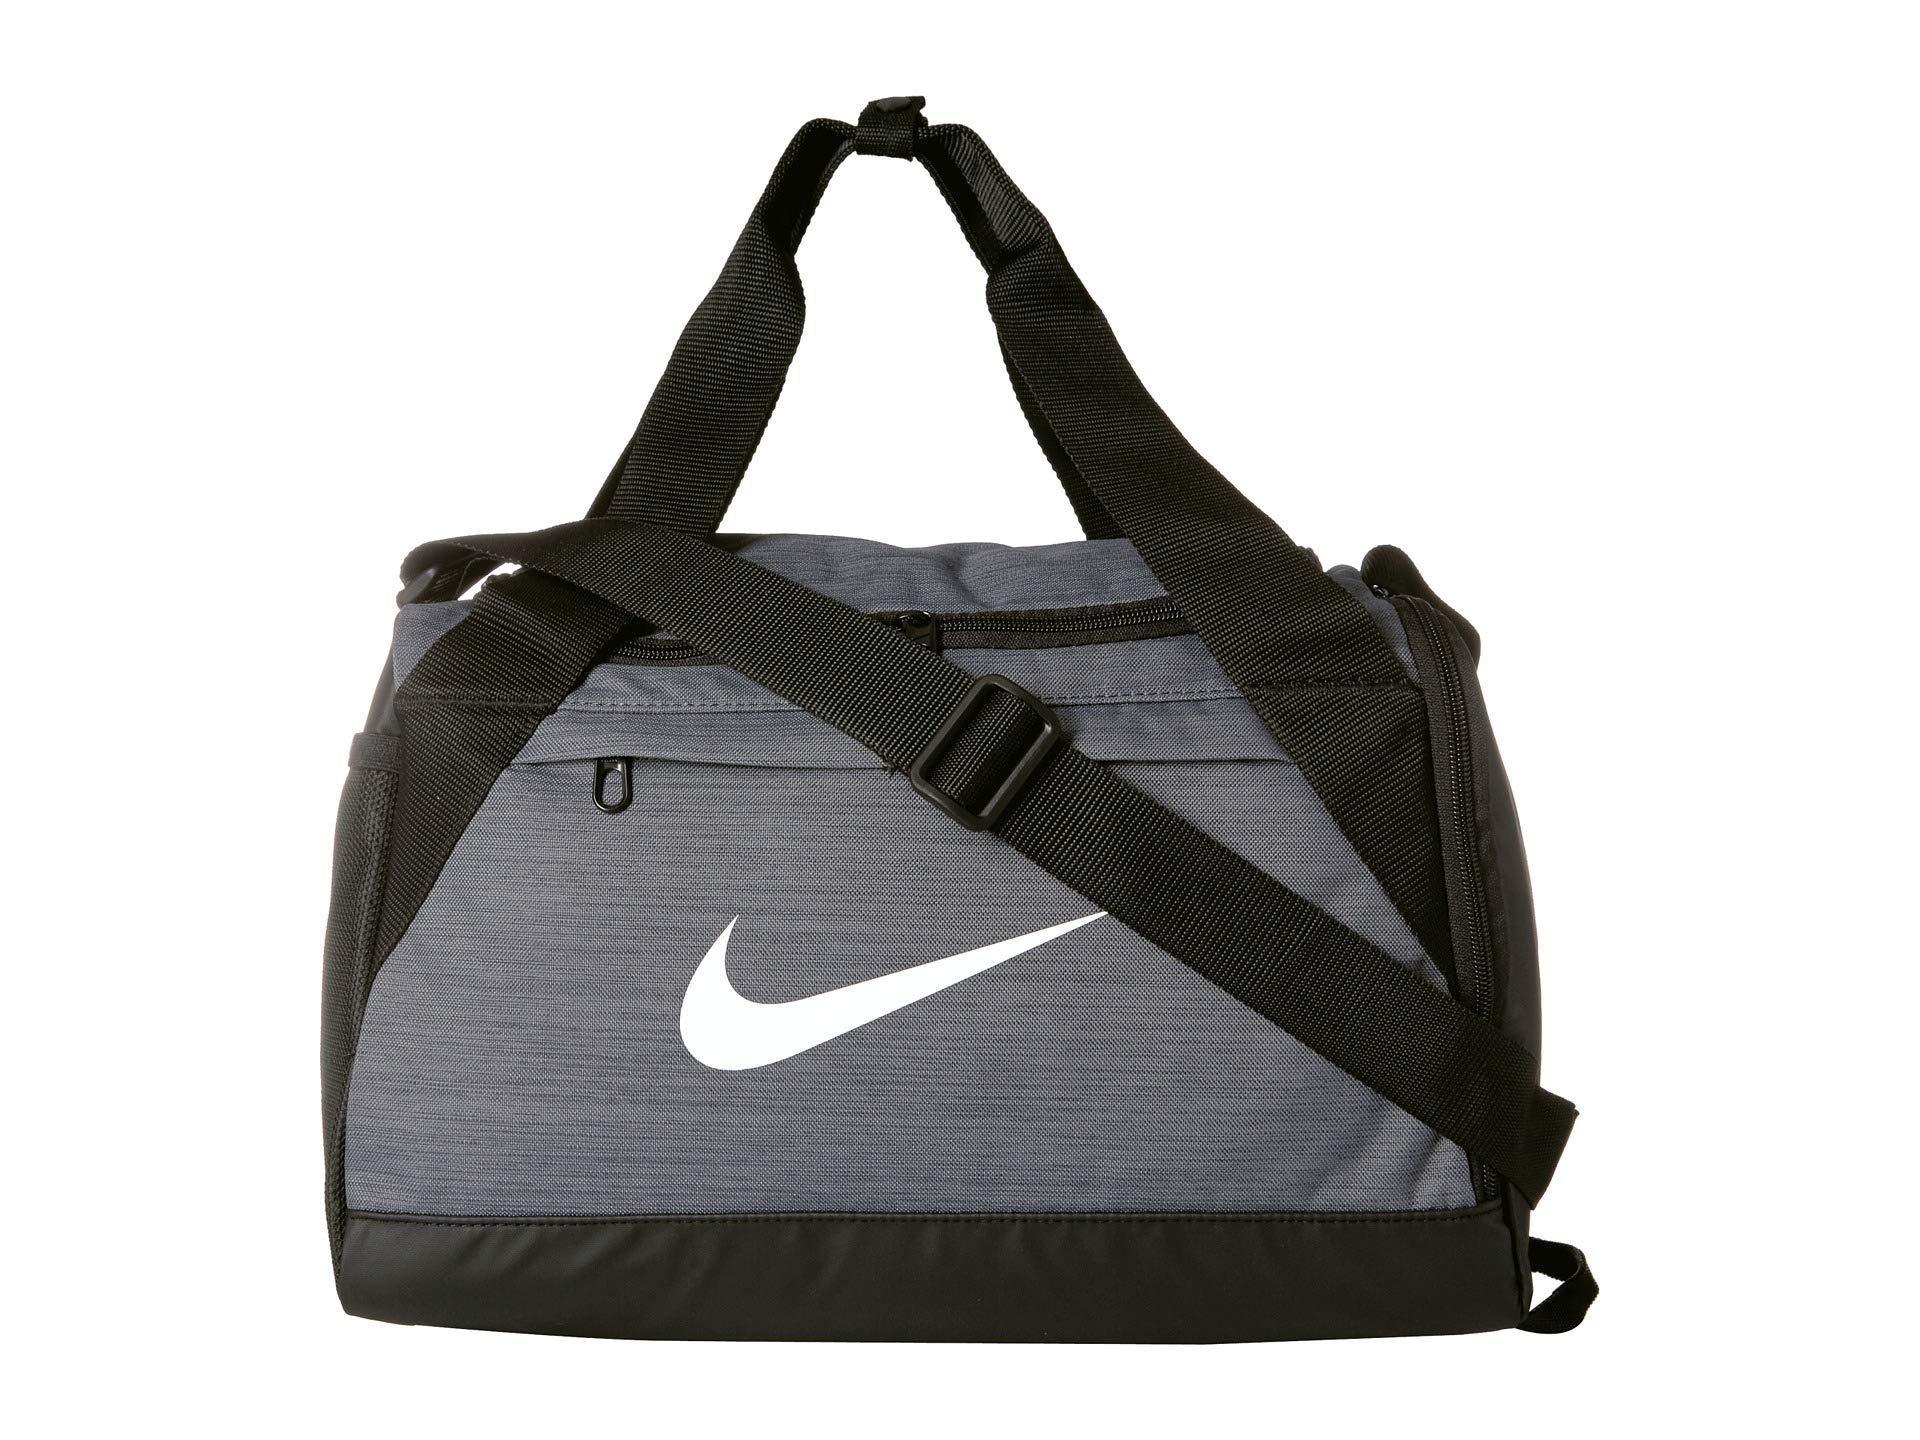 89a731eaaa41 Nike. Men s Brasilia Extra Small Training Duffel Bag (black black white) ...